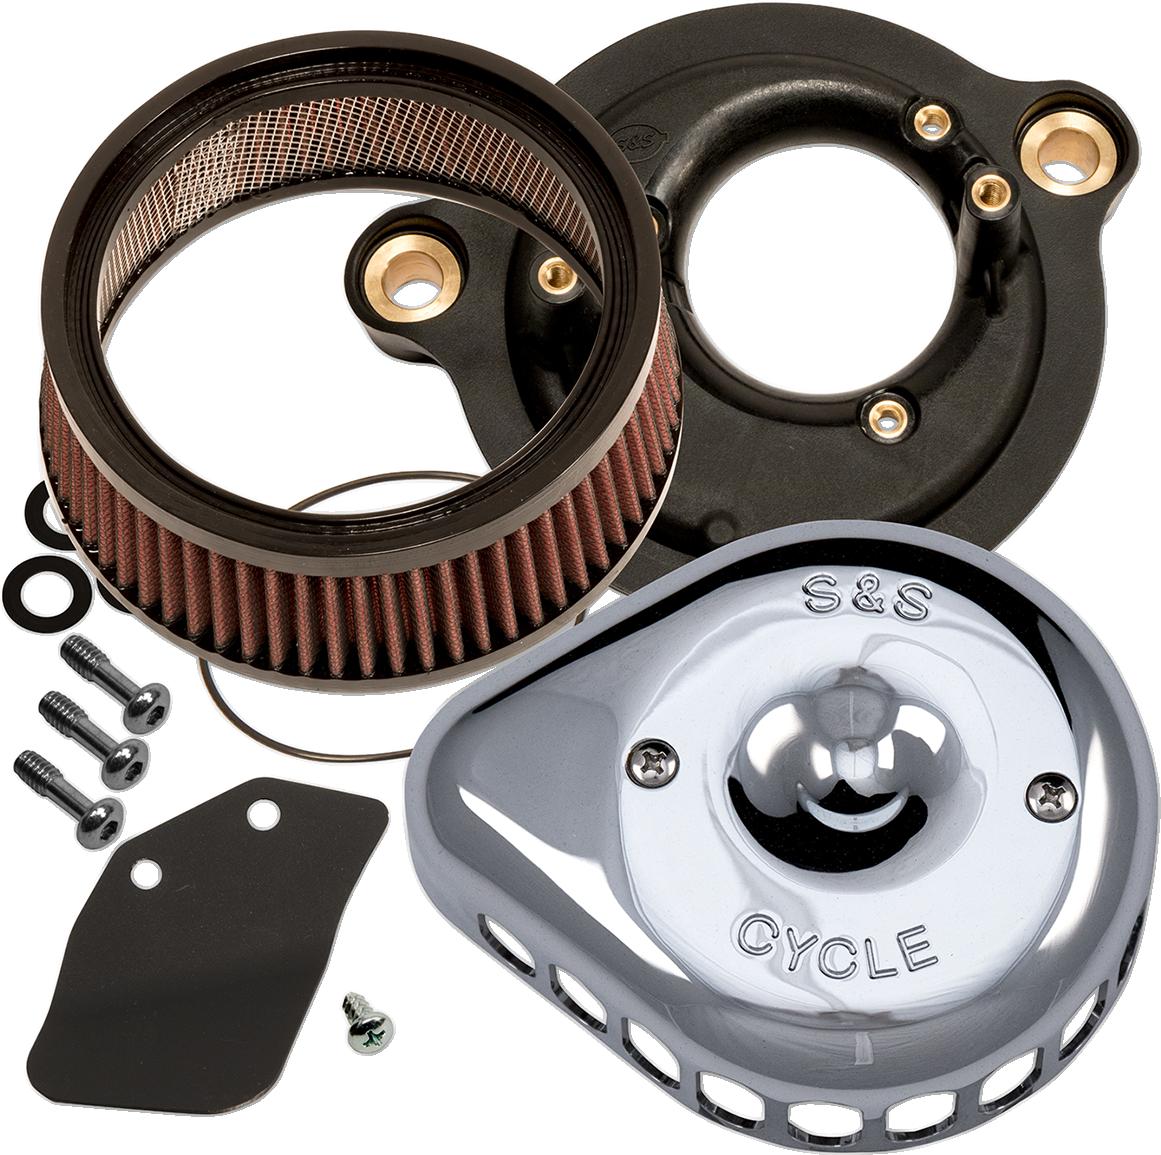 S&S Chrome Stealth Mini Teardrop Air Cleaner Kit for 08-17 Harley Touring FLSL